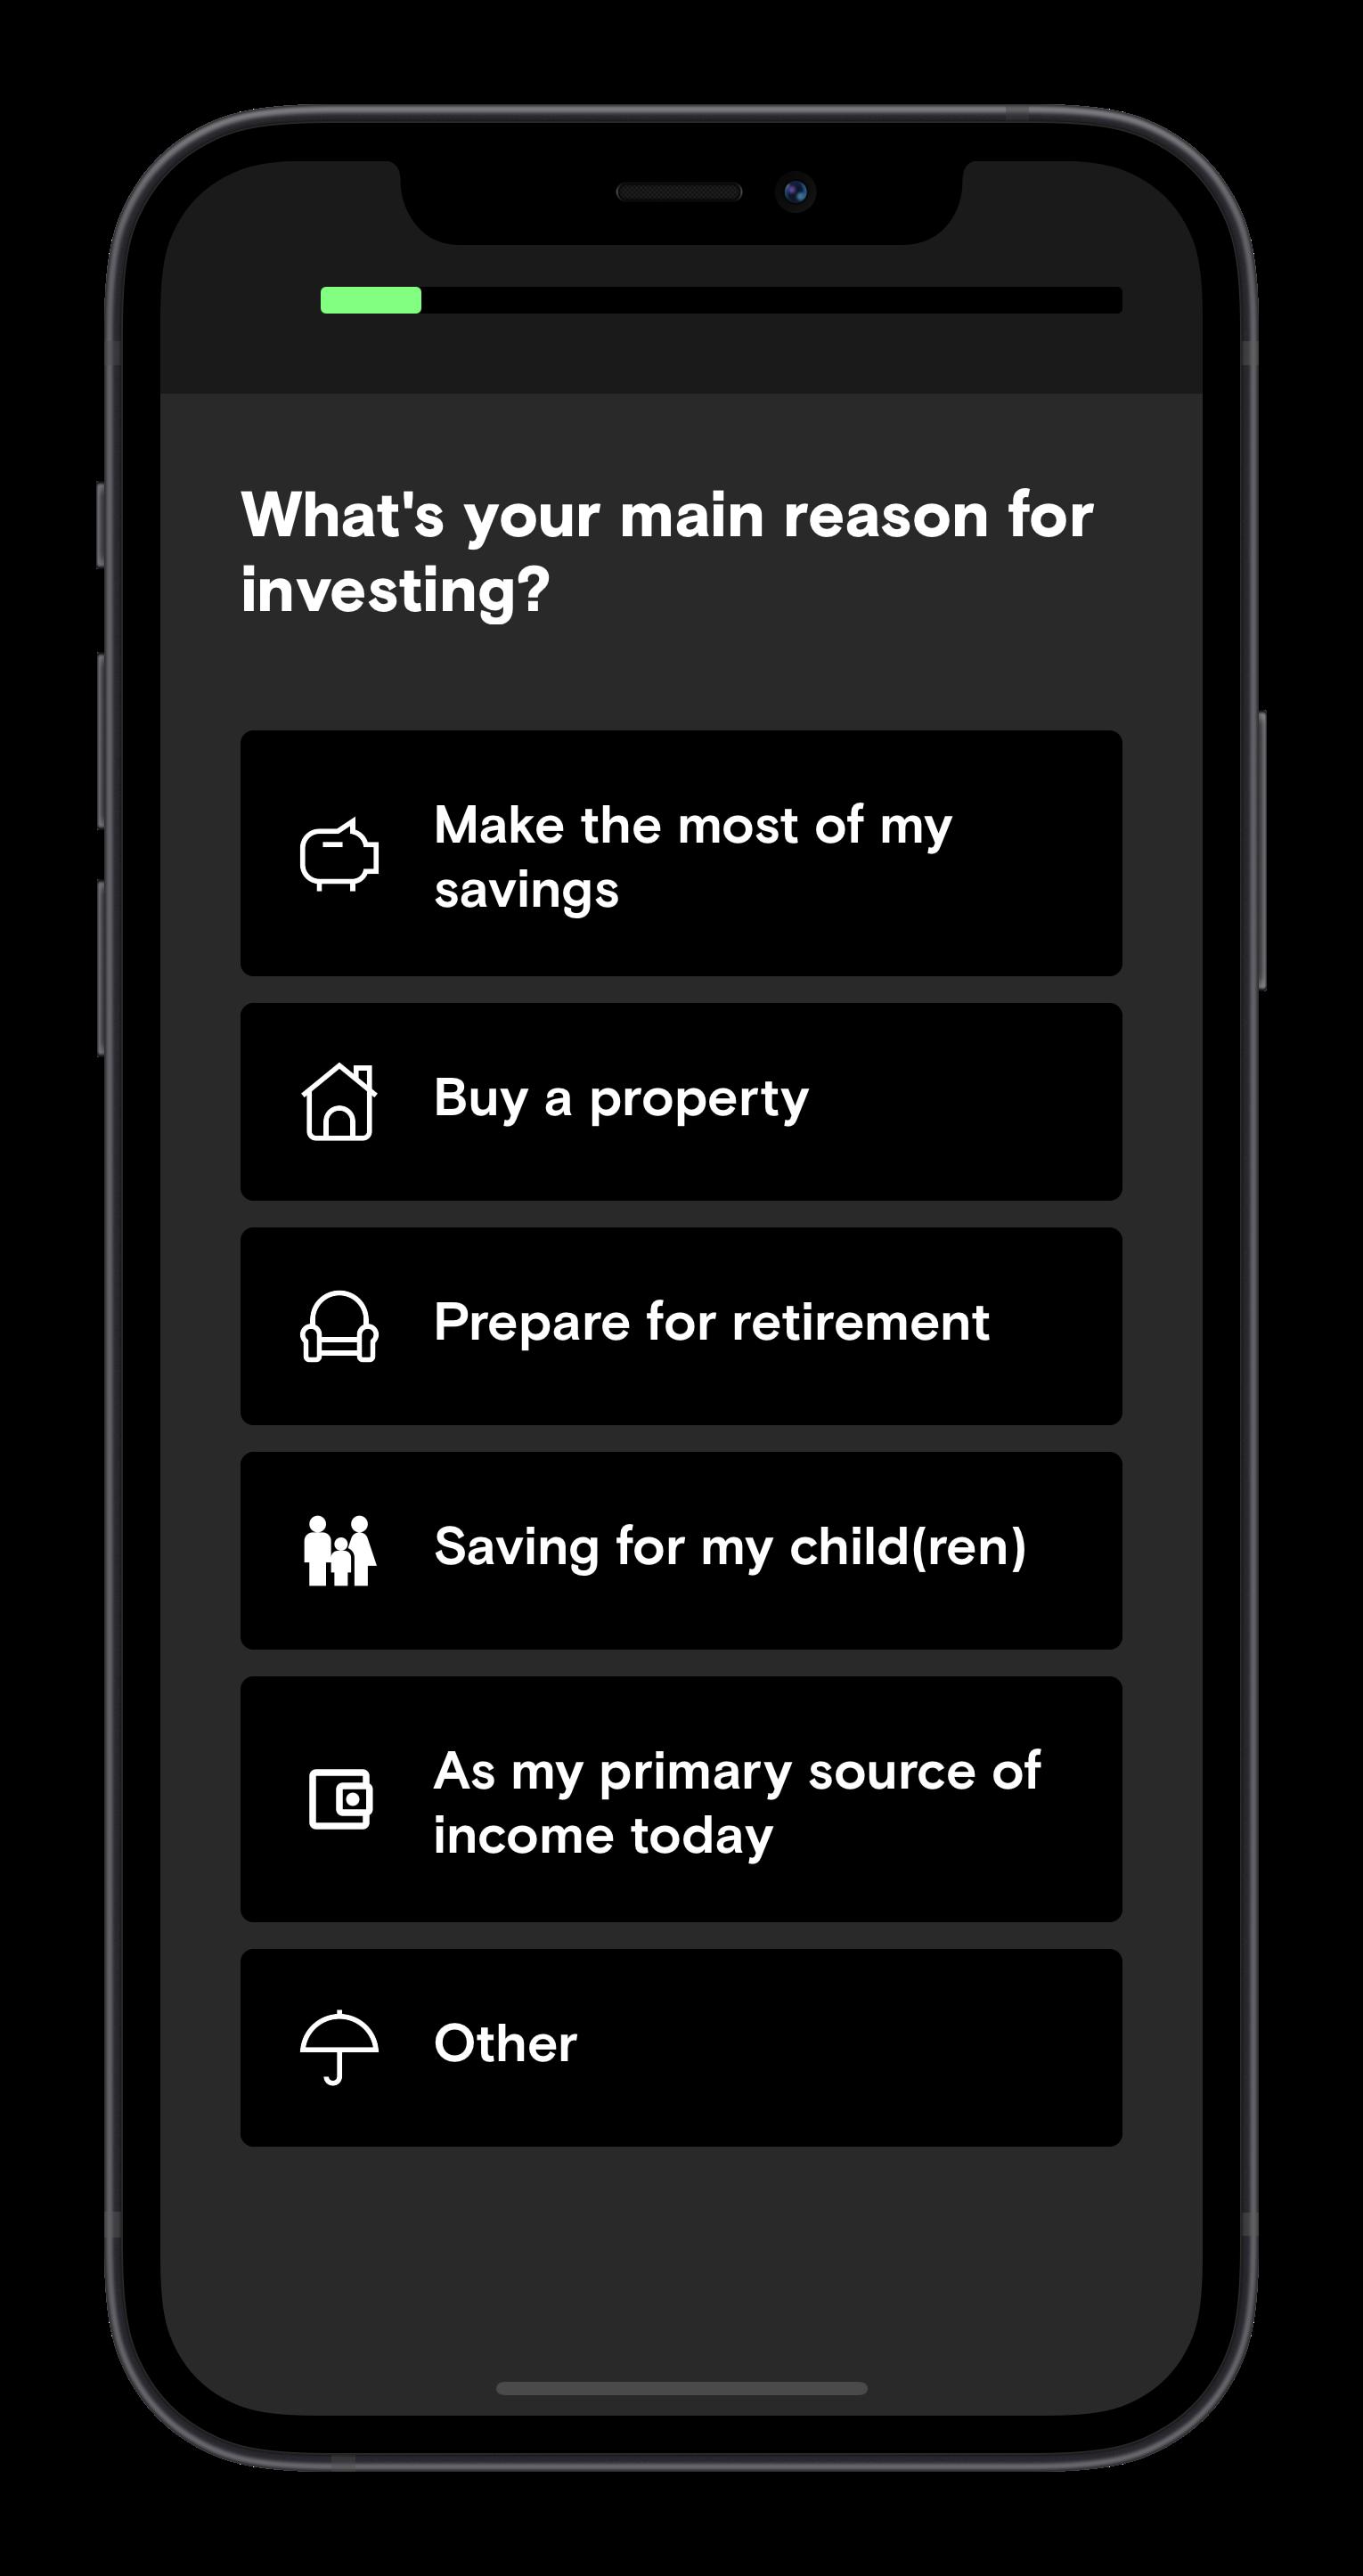 Risk profile question screen of the Curvo app